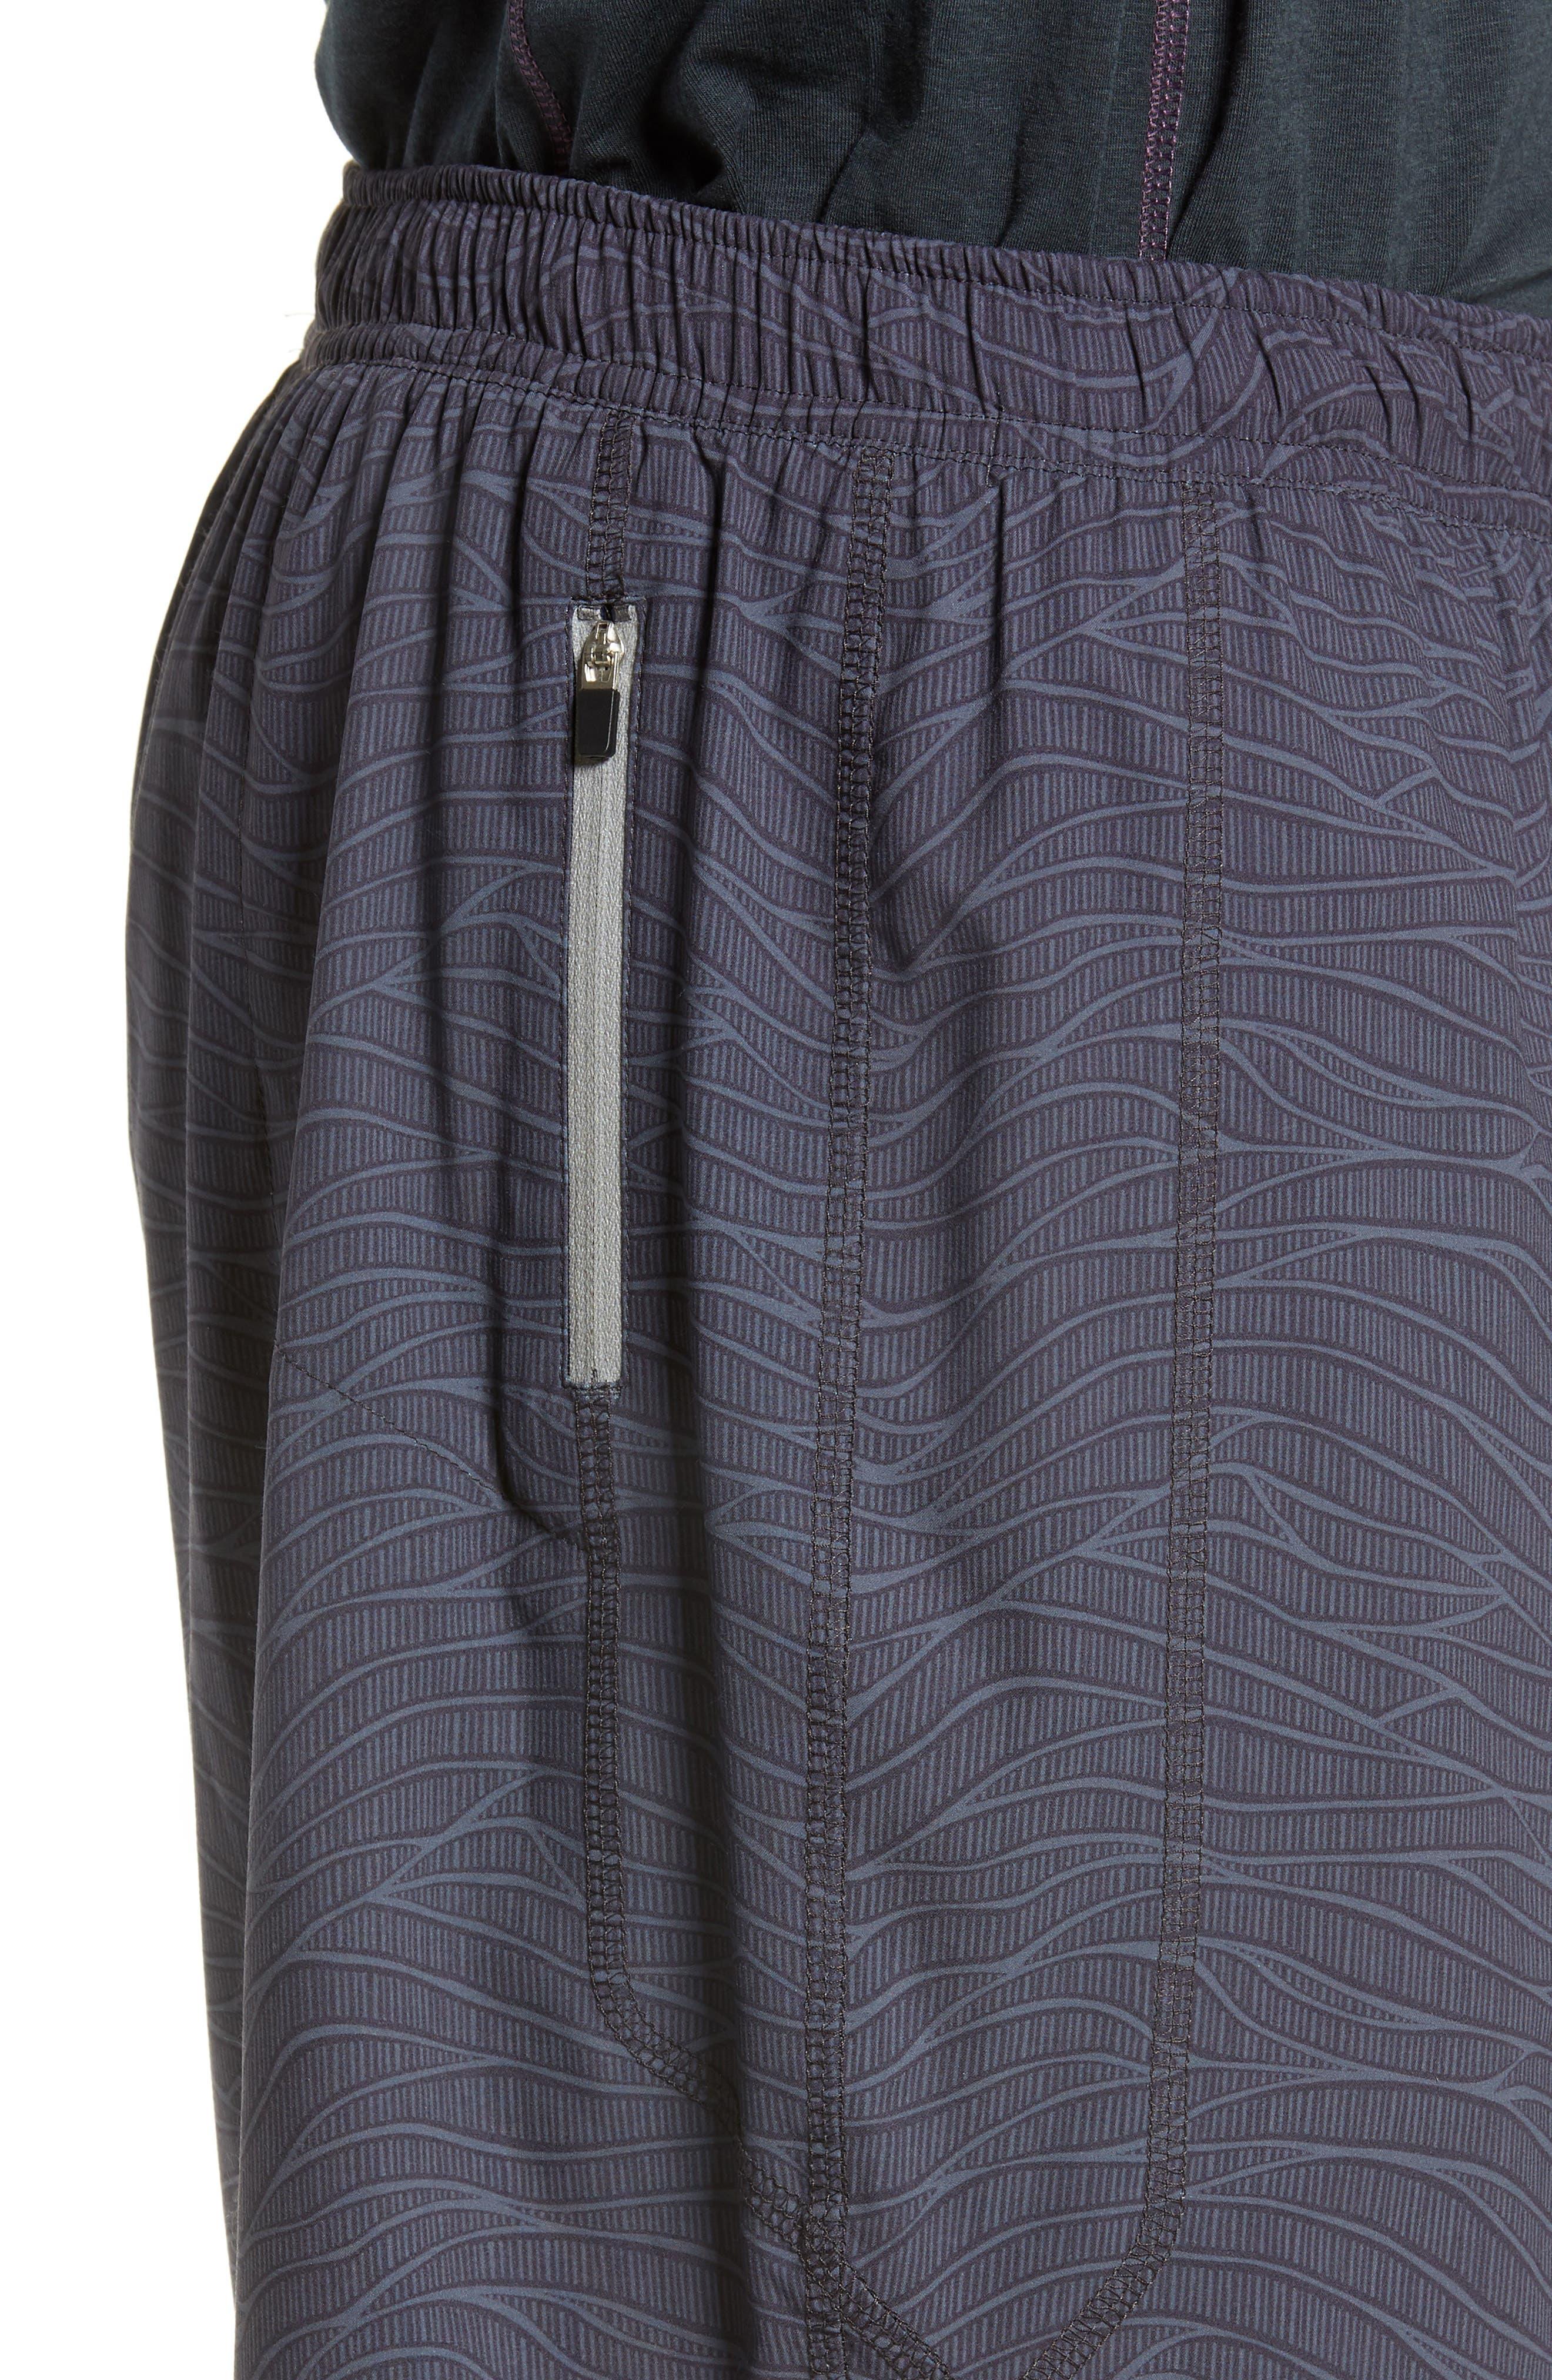 TASC PERFORMANCE, Propulsion Athletic Shorts, Alternate thumbnail 5, color, BLACK SONIC WAVE